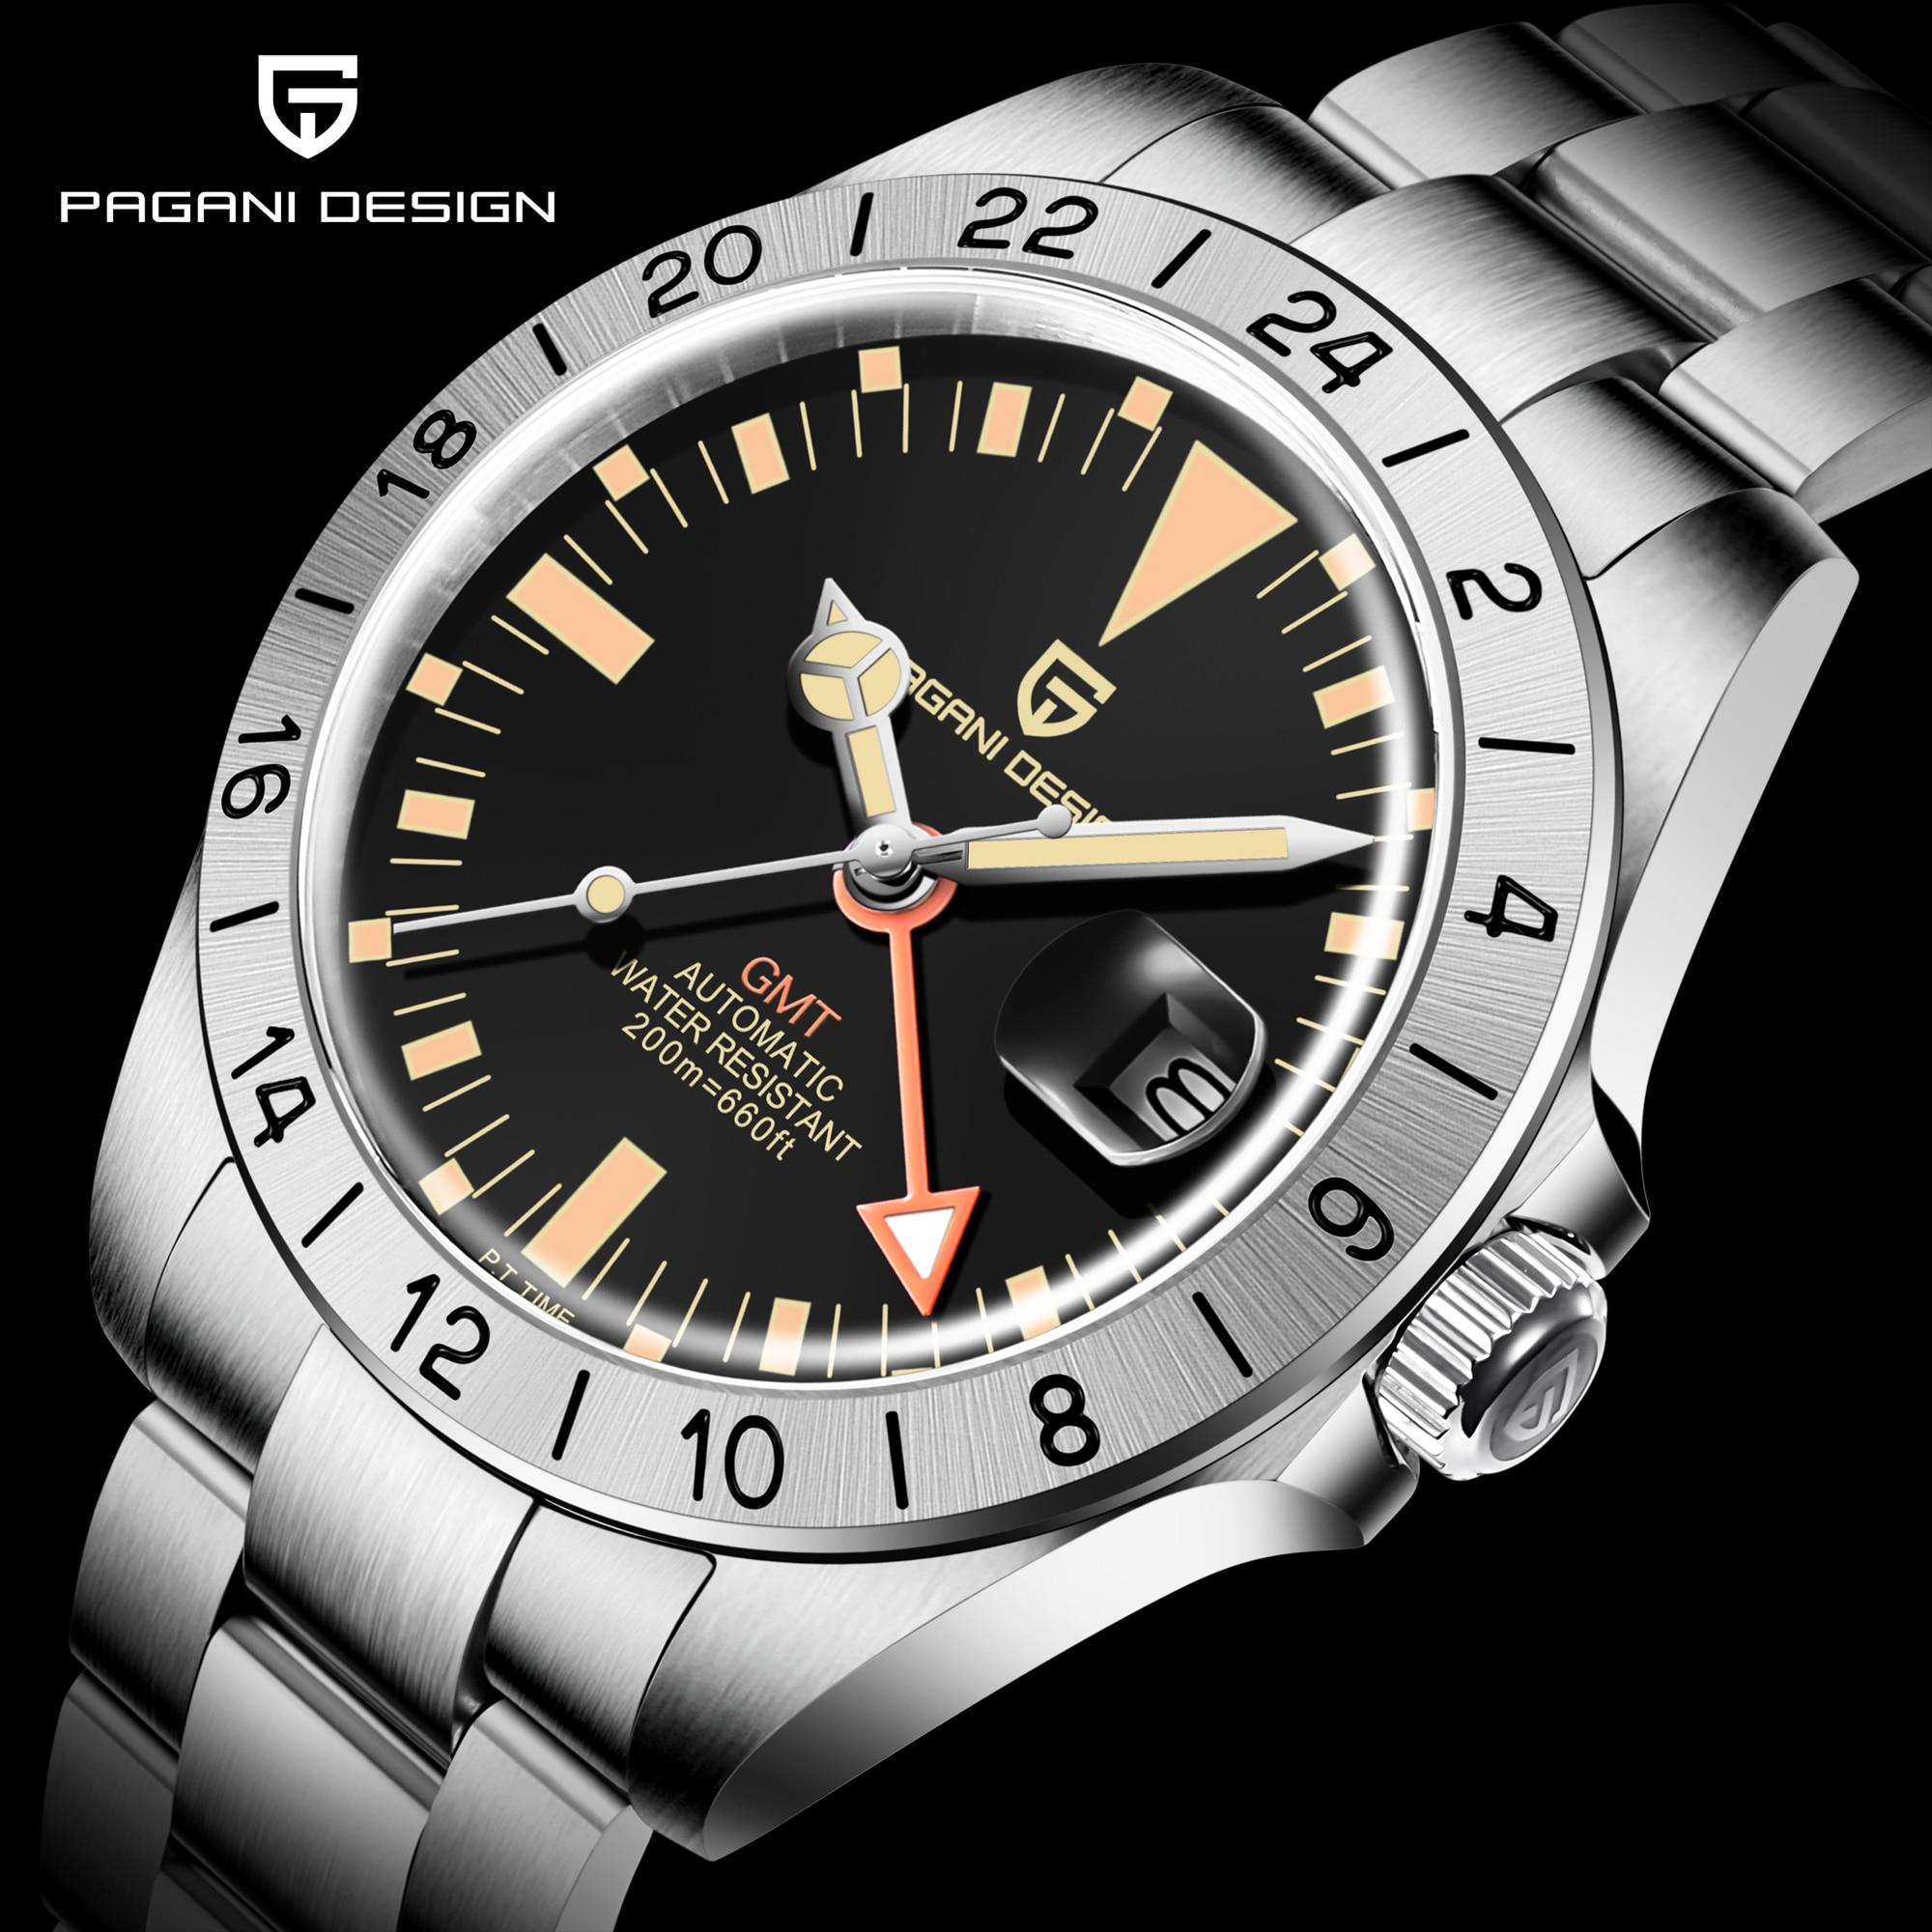 2021 PAGANI تصميم العلامة التجارية الجديدة 42 مللي متر الرجال التلقائي ساعات آلية فاخرة الياقوت الفولاذ المقاوم للصدأ الرجال ساعة reloj hombre